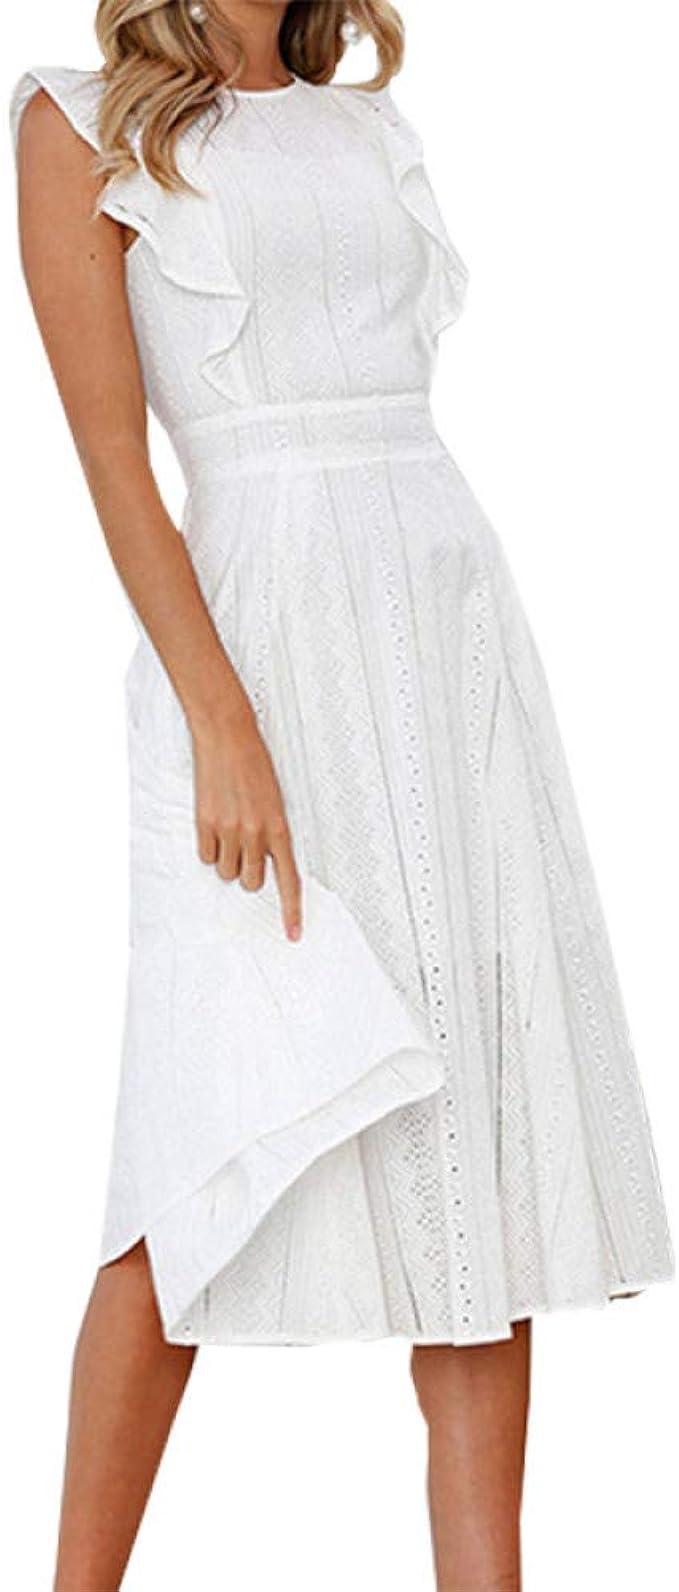 SKBOOS Mode Sommer A-line Spitze Weißes Kleid Boho Beach Solide